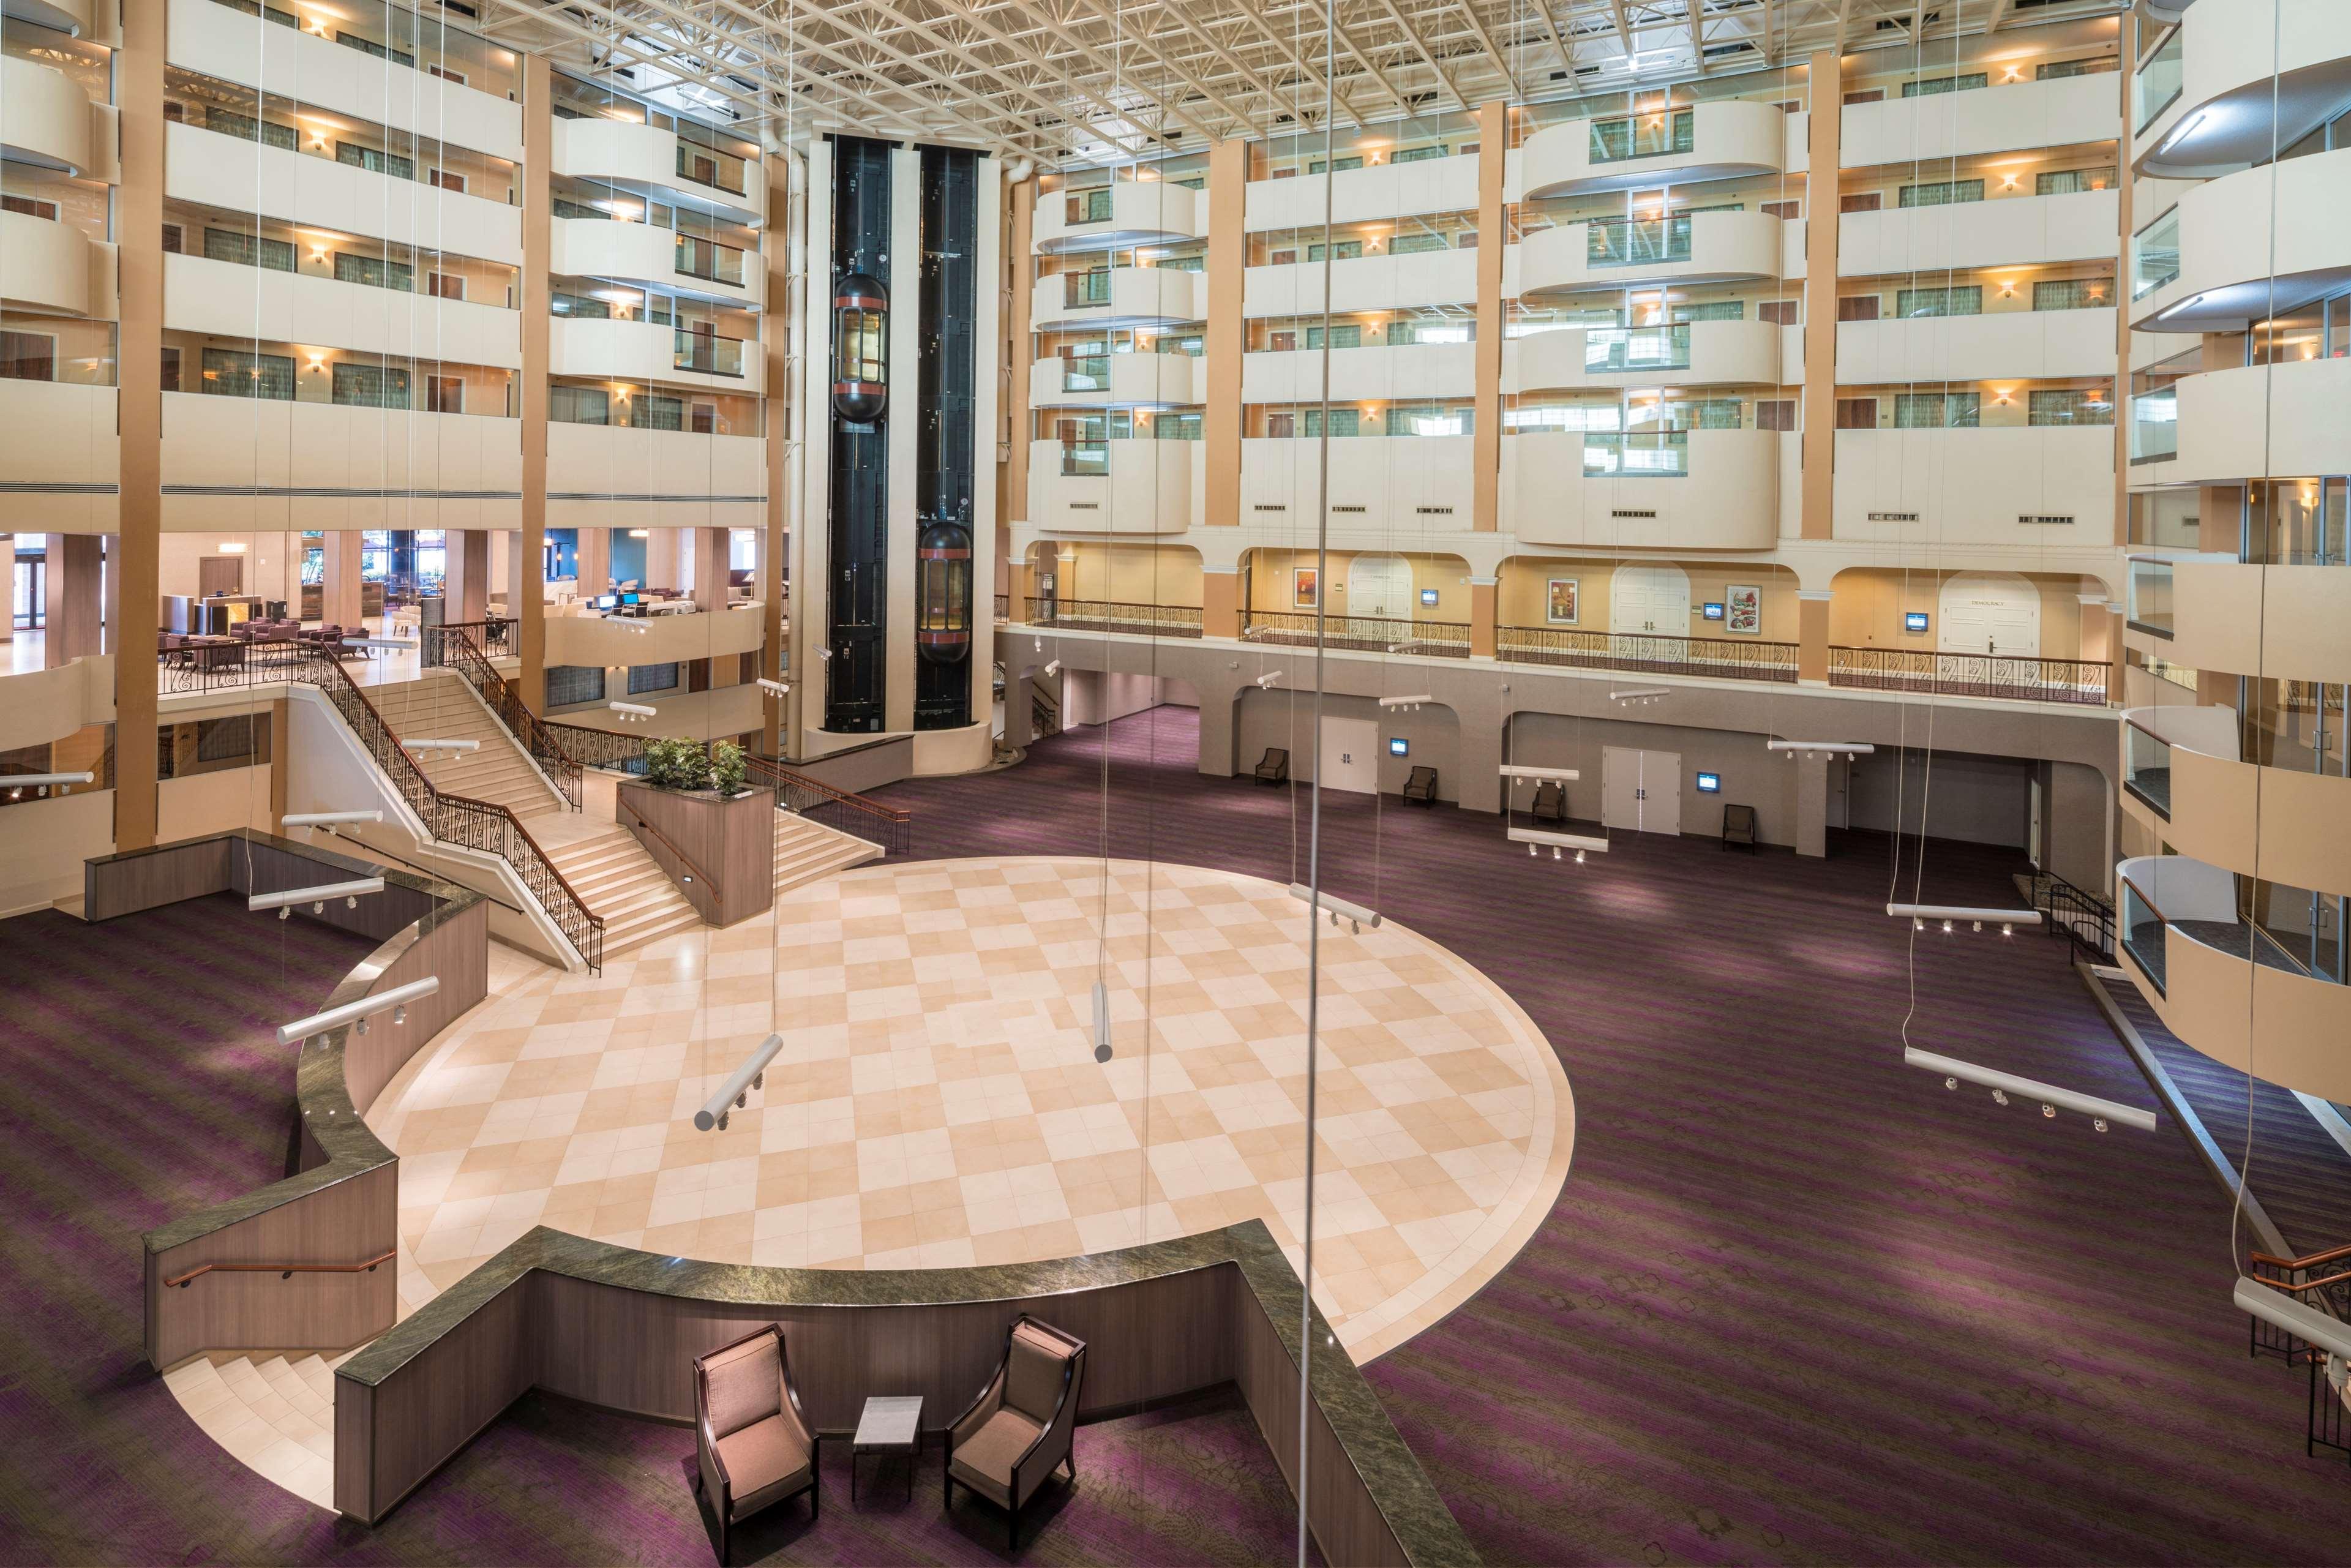 Hilton Washington DC/Rockville Hotel & Executive Meeting Ctr image 10